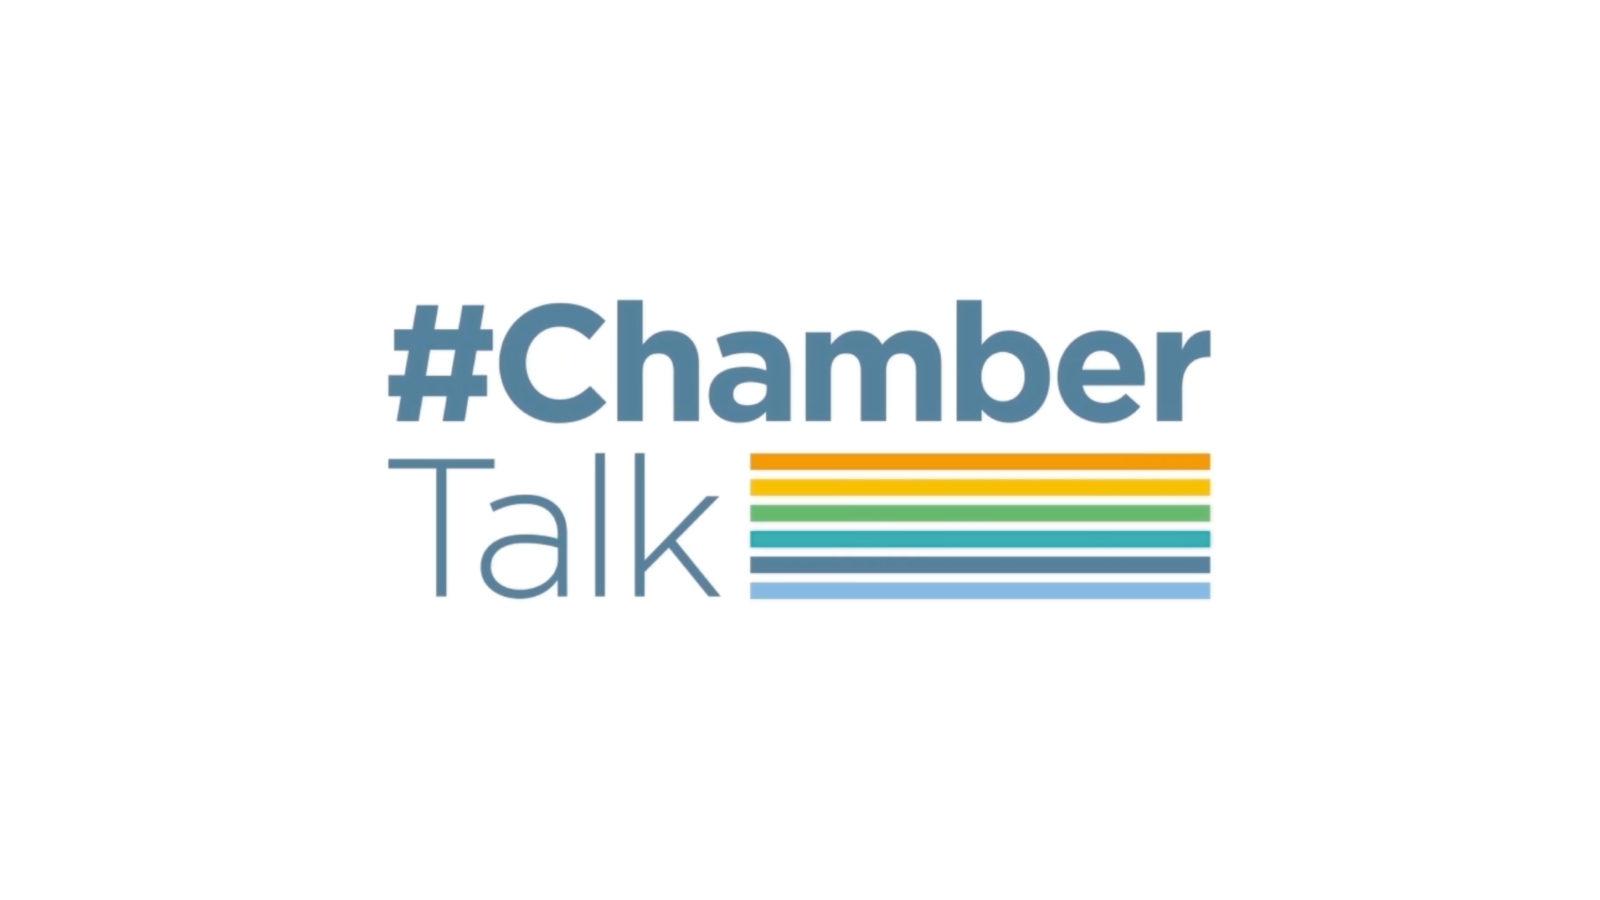 Chambertalk logo